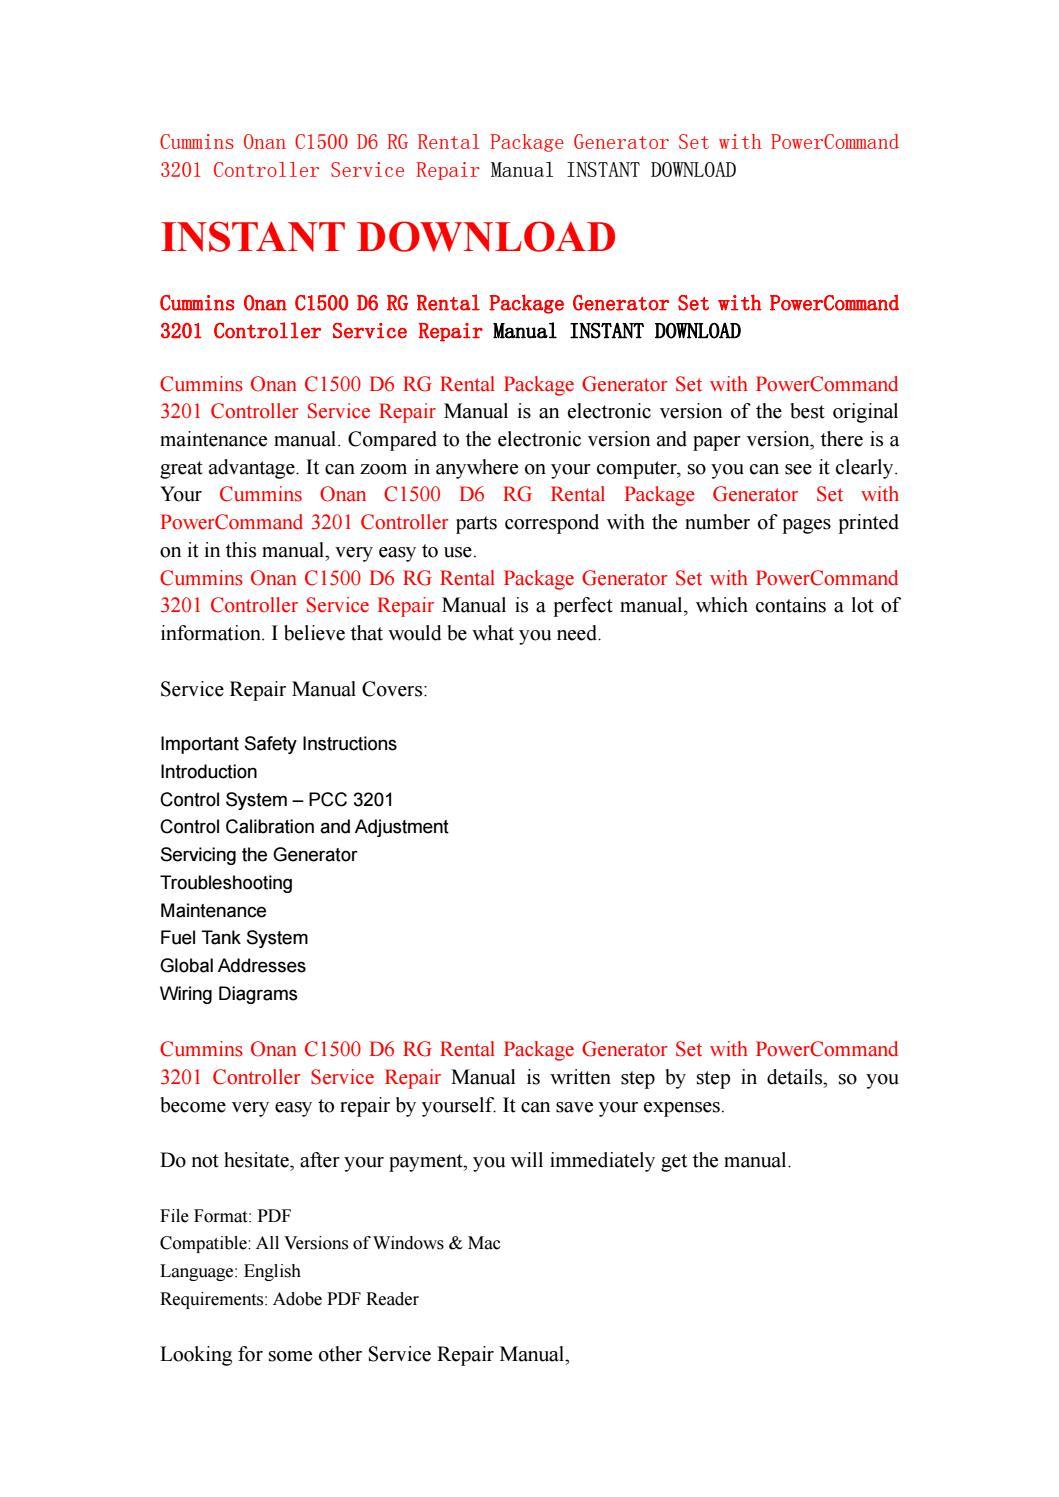 cummins onan c1500 d6 rg rental package generator set with rh issuu com Cummins Engine Manual Instruction Manual Cummins